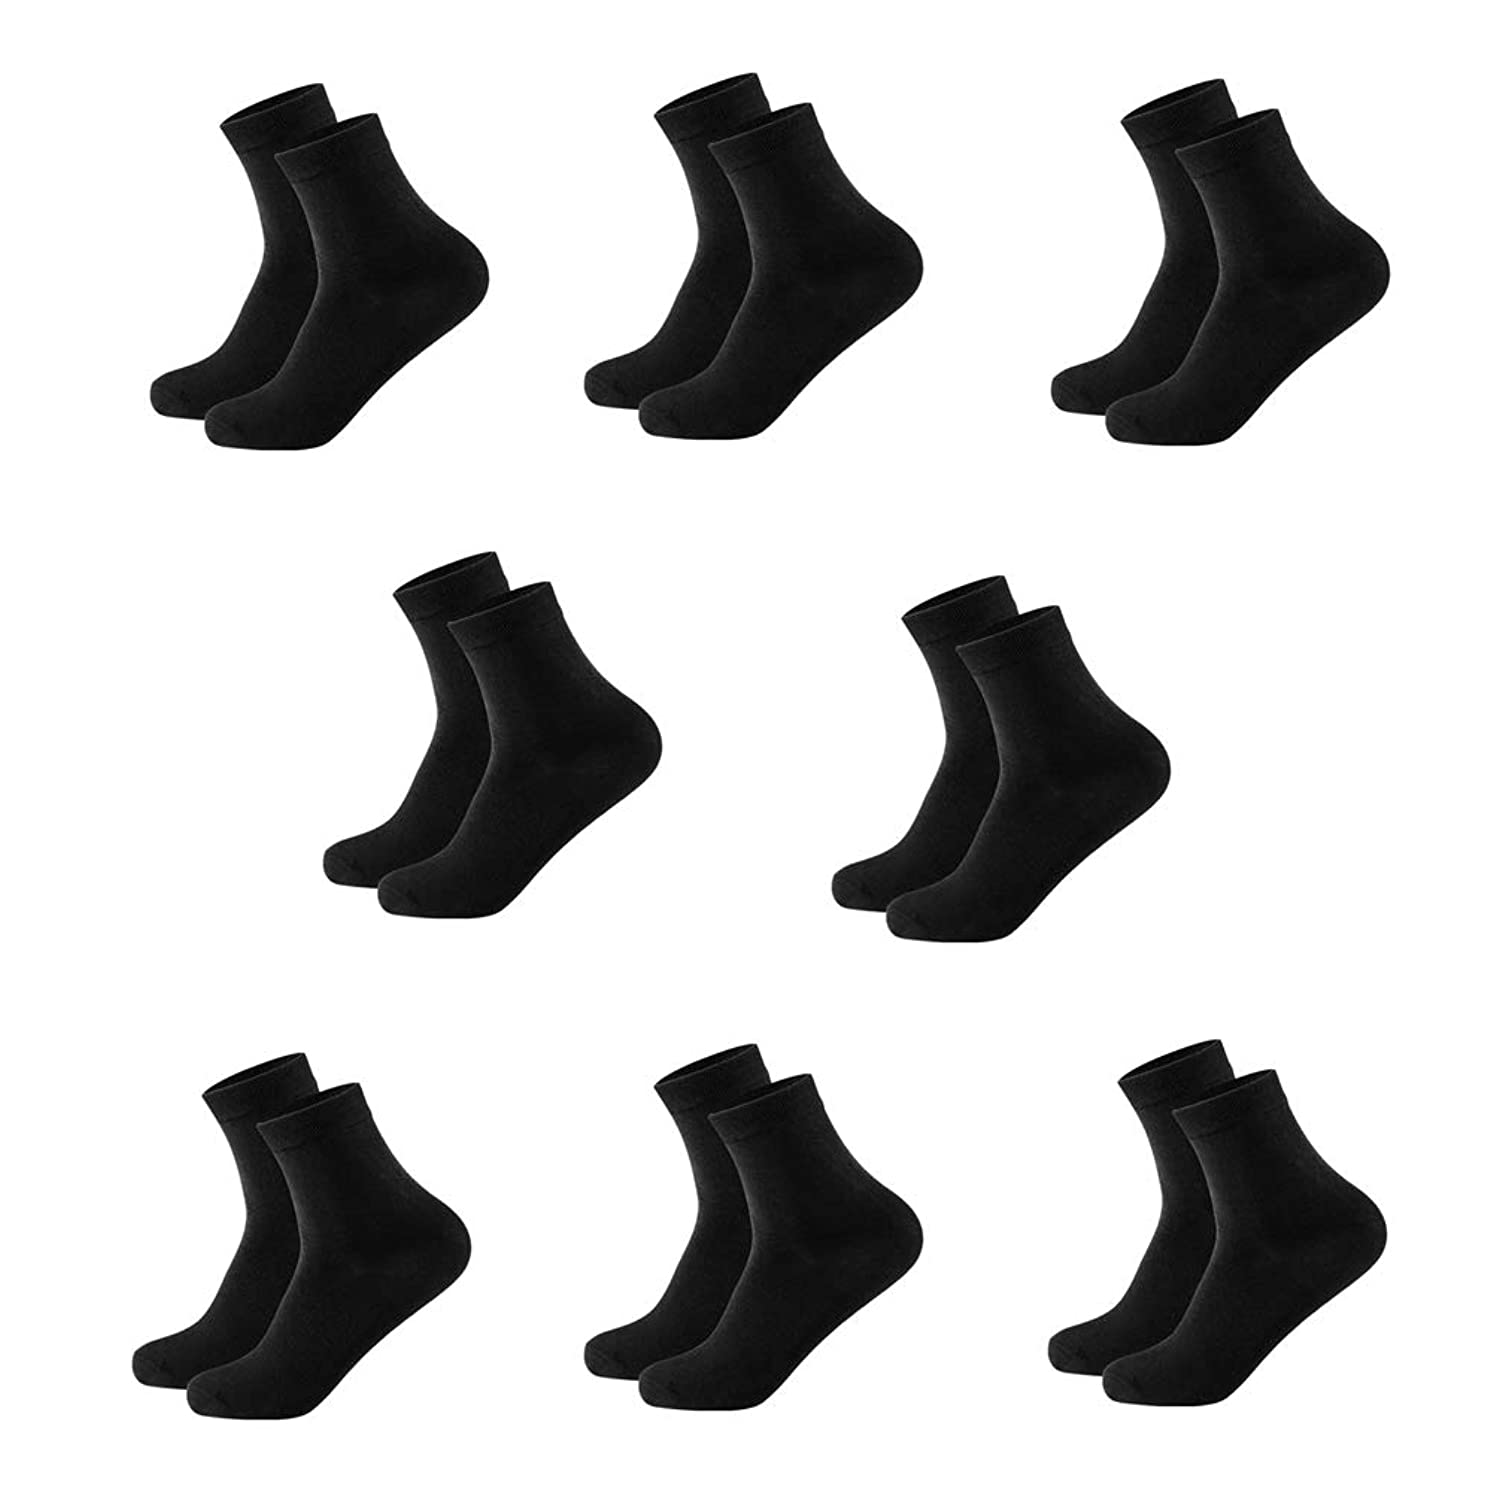 Cotton Bamboo Blend Women Socks Quarter Length Socks Athletic Odor-free Set of 4 Pairs Size 5-8